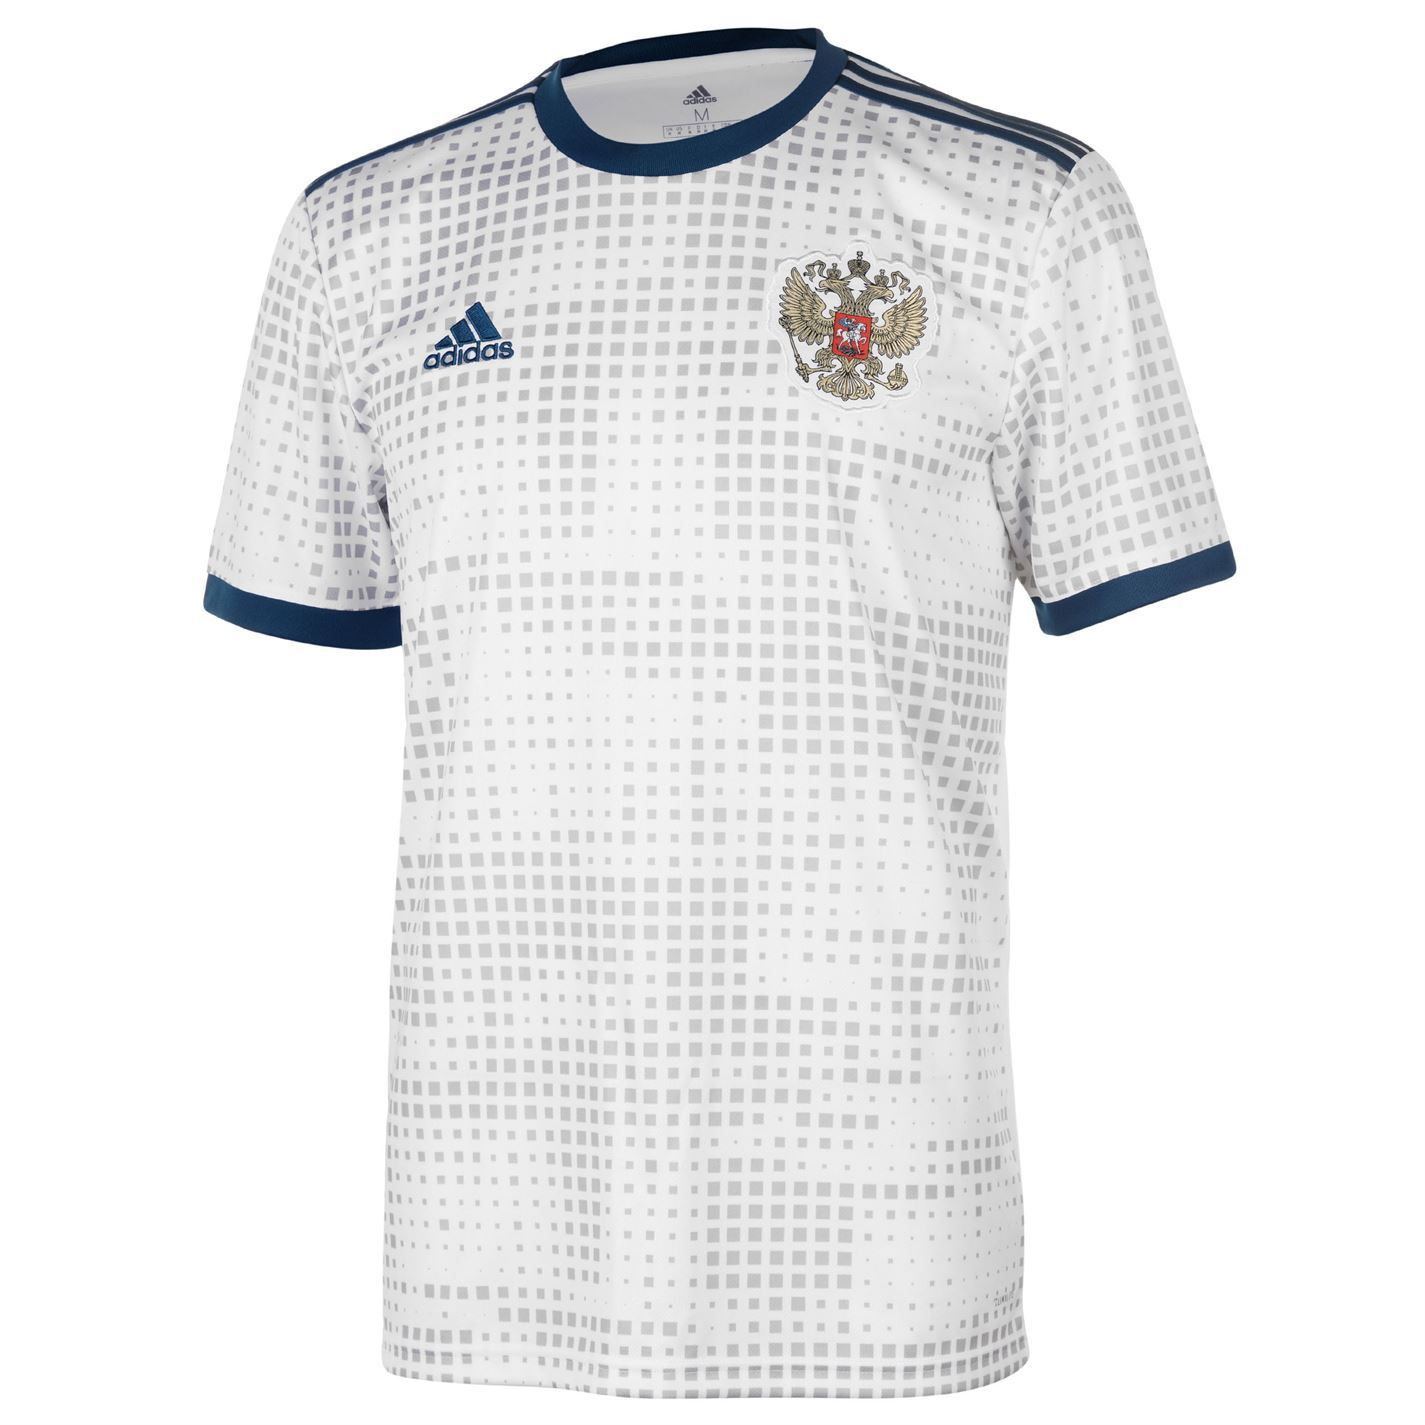 d837aedcf5ee6 ... Adidas Rusia lejos Jersey 2018 Mens blanco fútbol fútbol Top camisa  tira ...